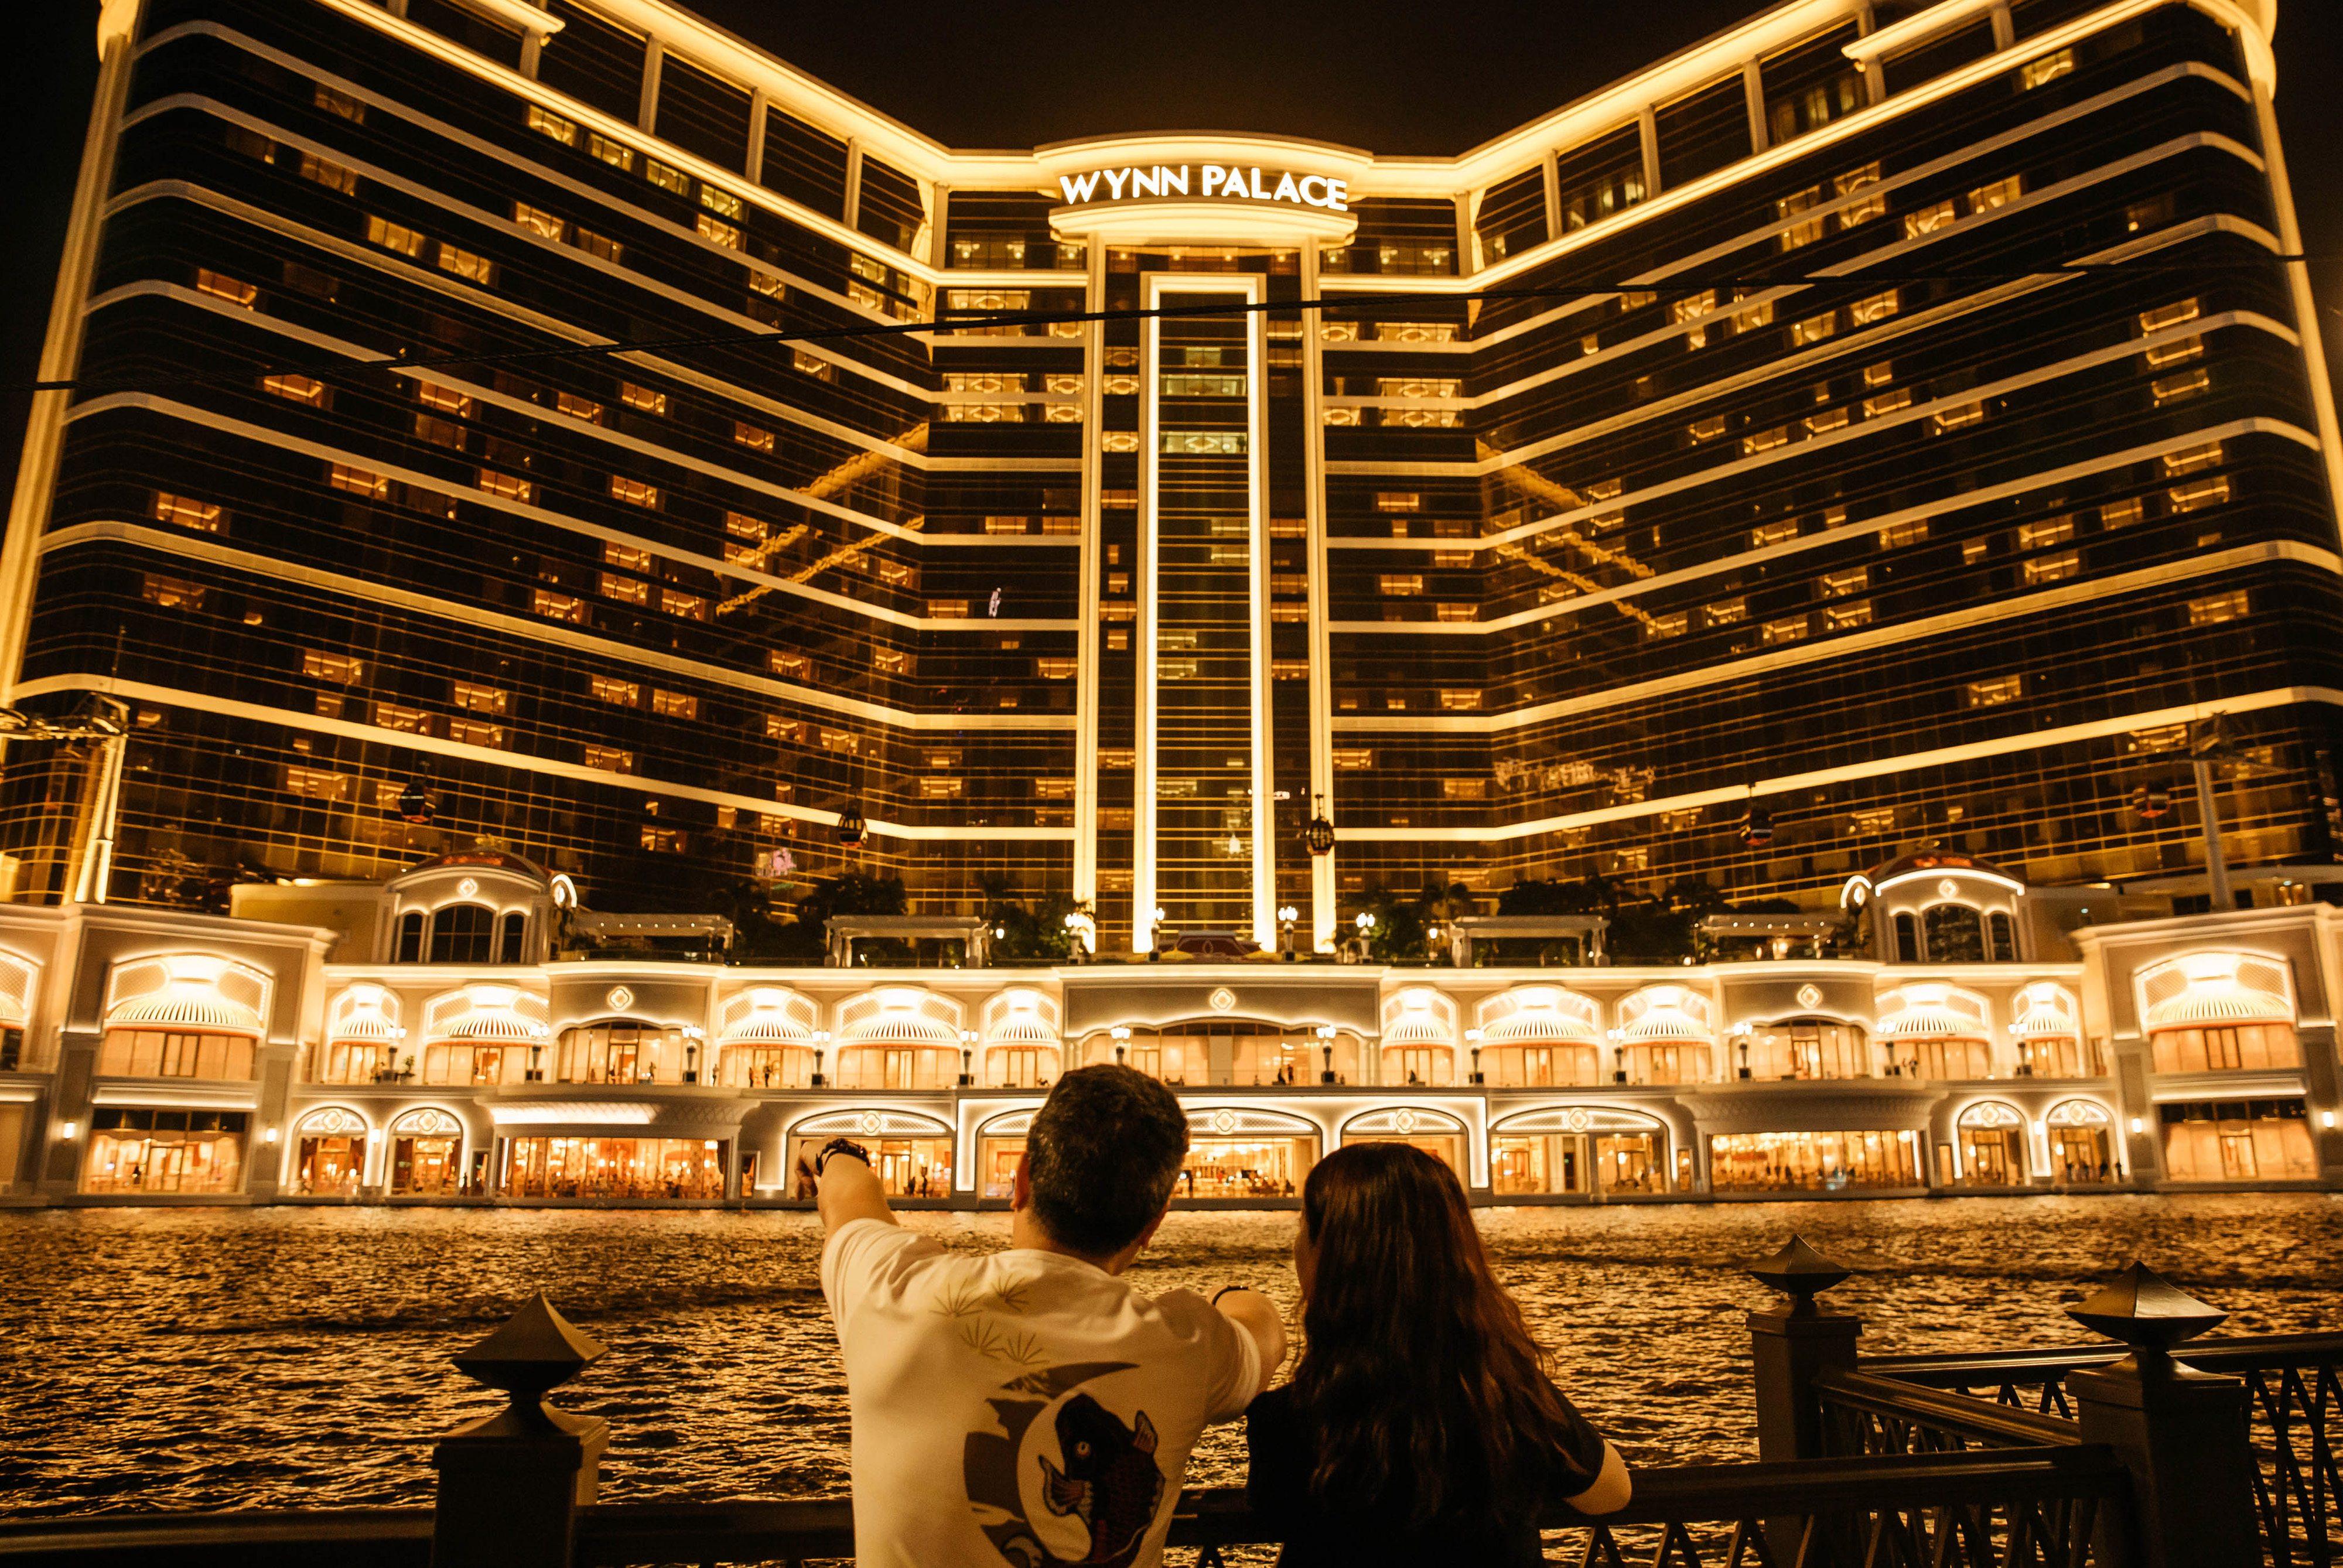 Macau china wynn casino casino across from the palms